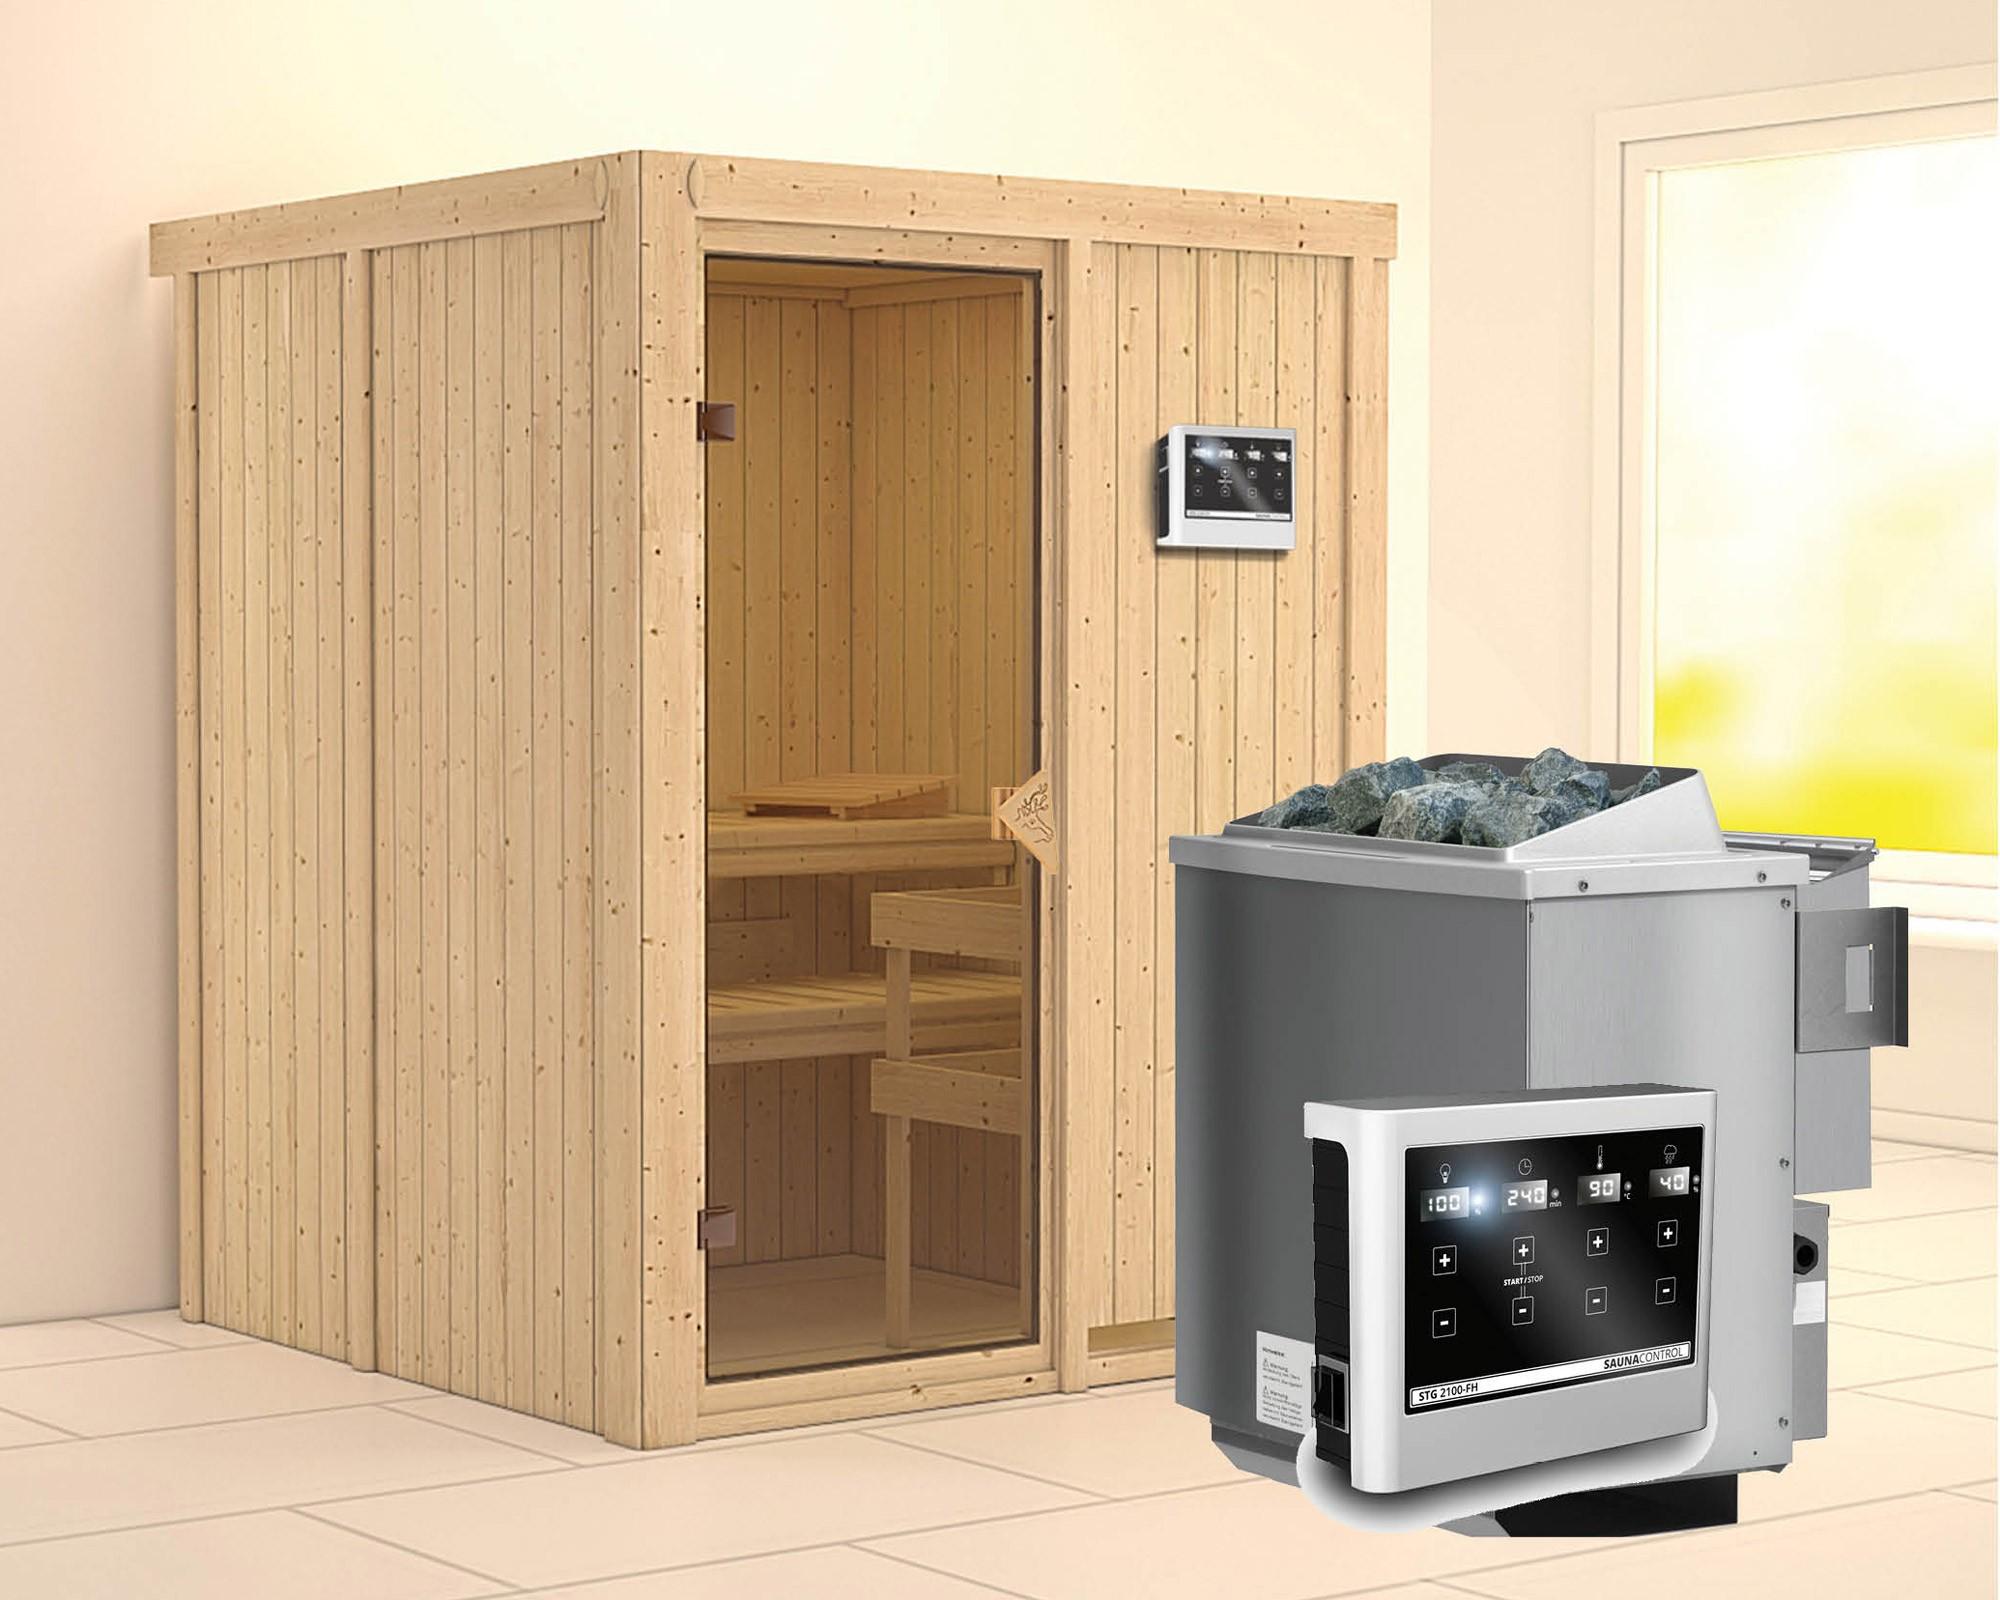 Karibu Sauna Norin 68mm mit Bio Saunaofen 9kW extern classic Tür Bild 1